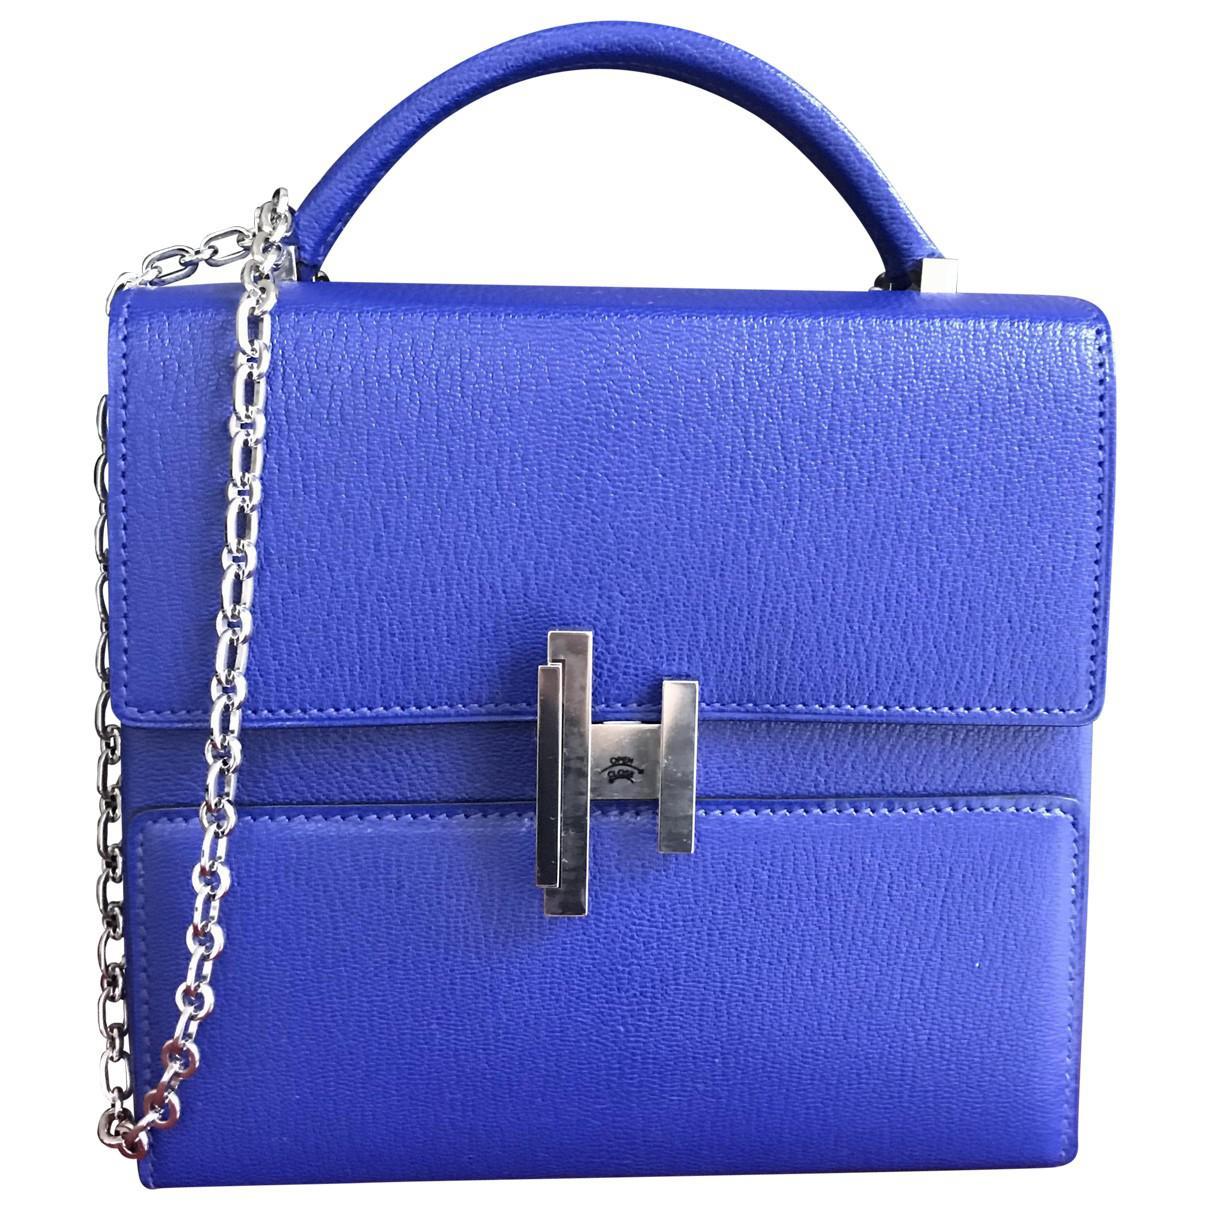 db7e55fd4f Hermès Pre-owned Leather Crossbody Bag in Blue - Lyst